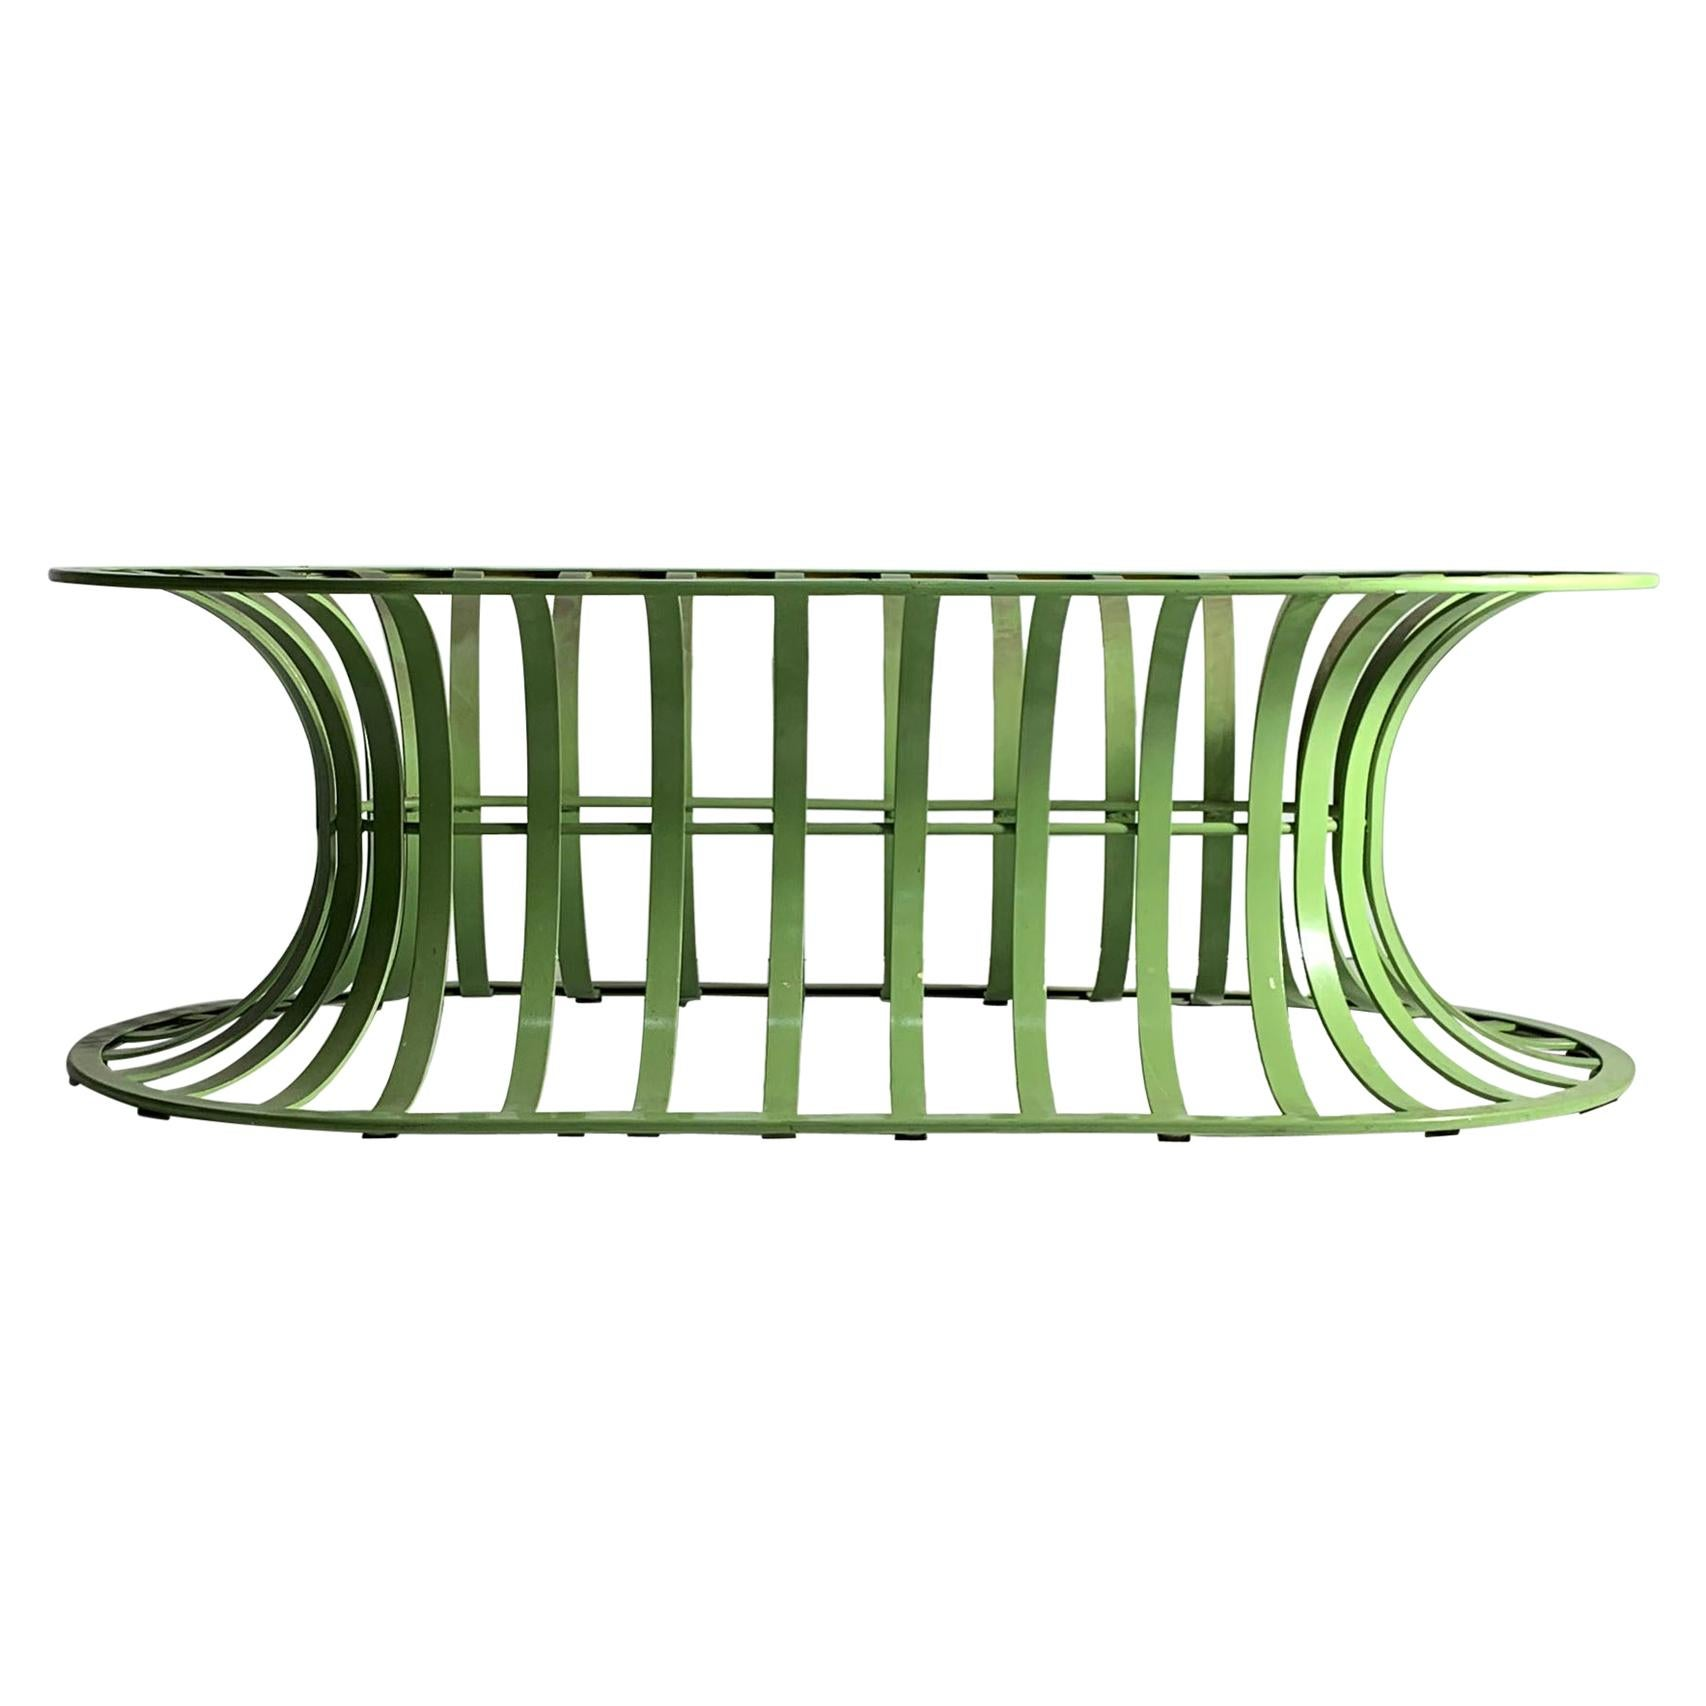 Vintage Modern Woodard Bench / Coffee Table in Lime